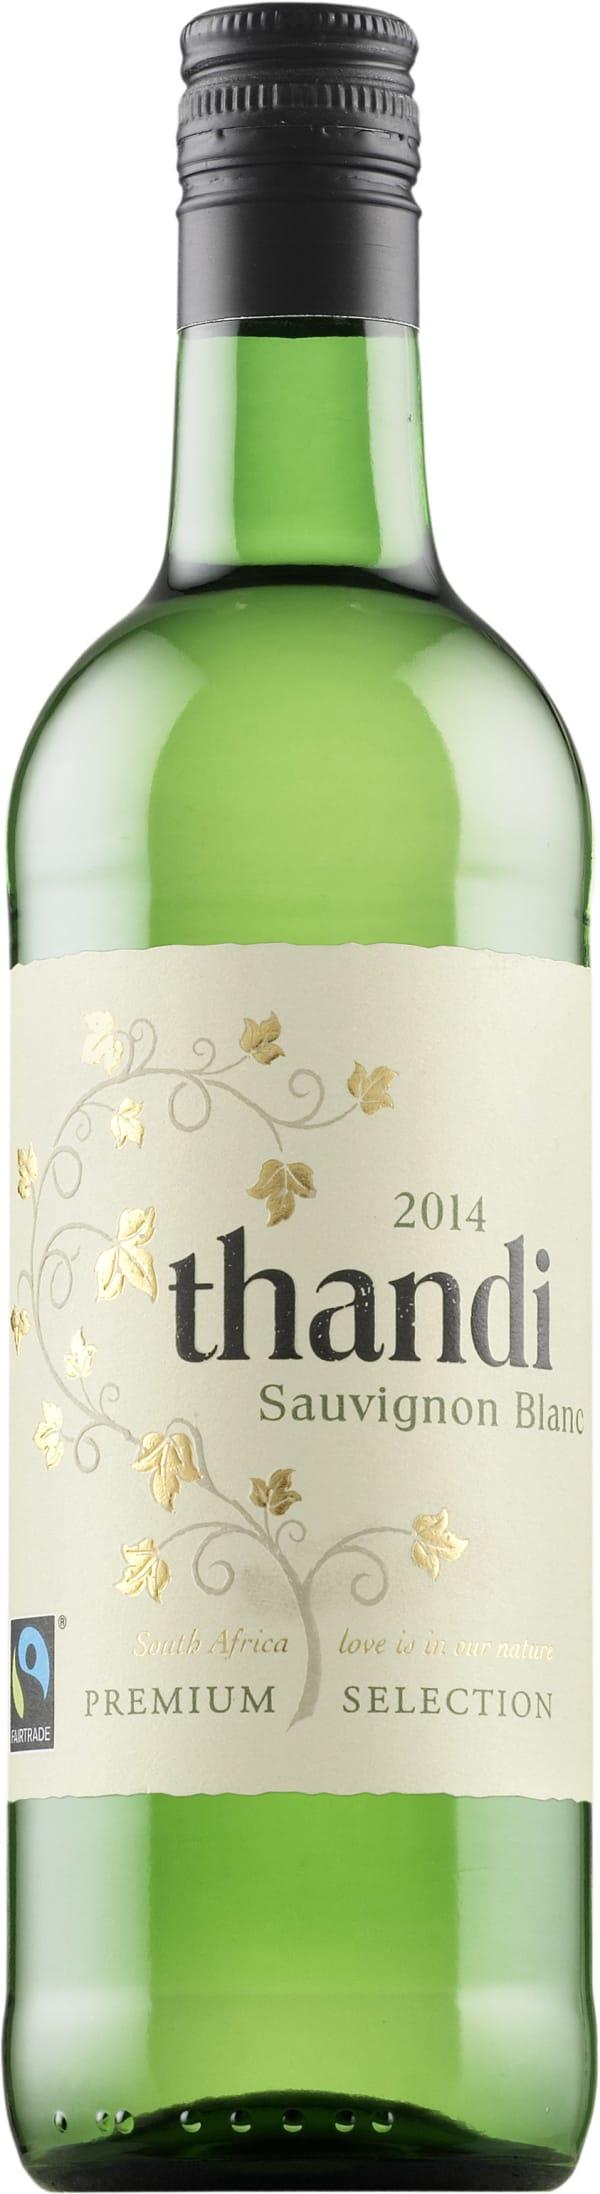 Thandi Sauvignon Blanc 2016